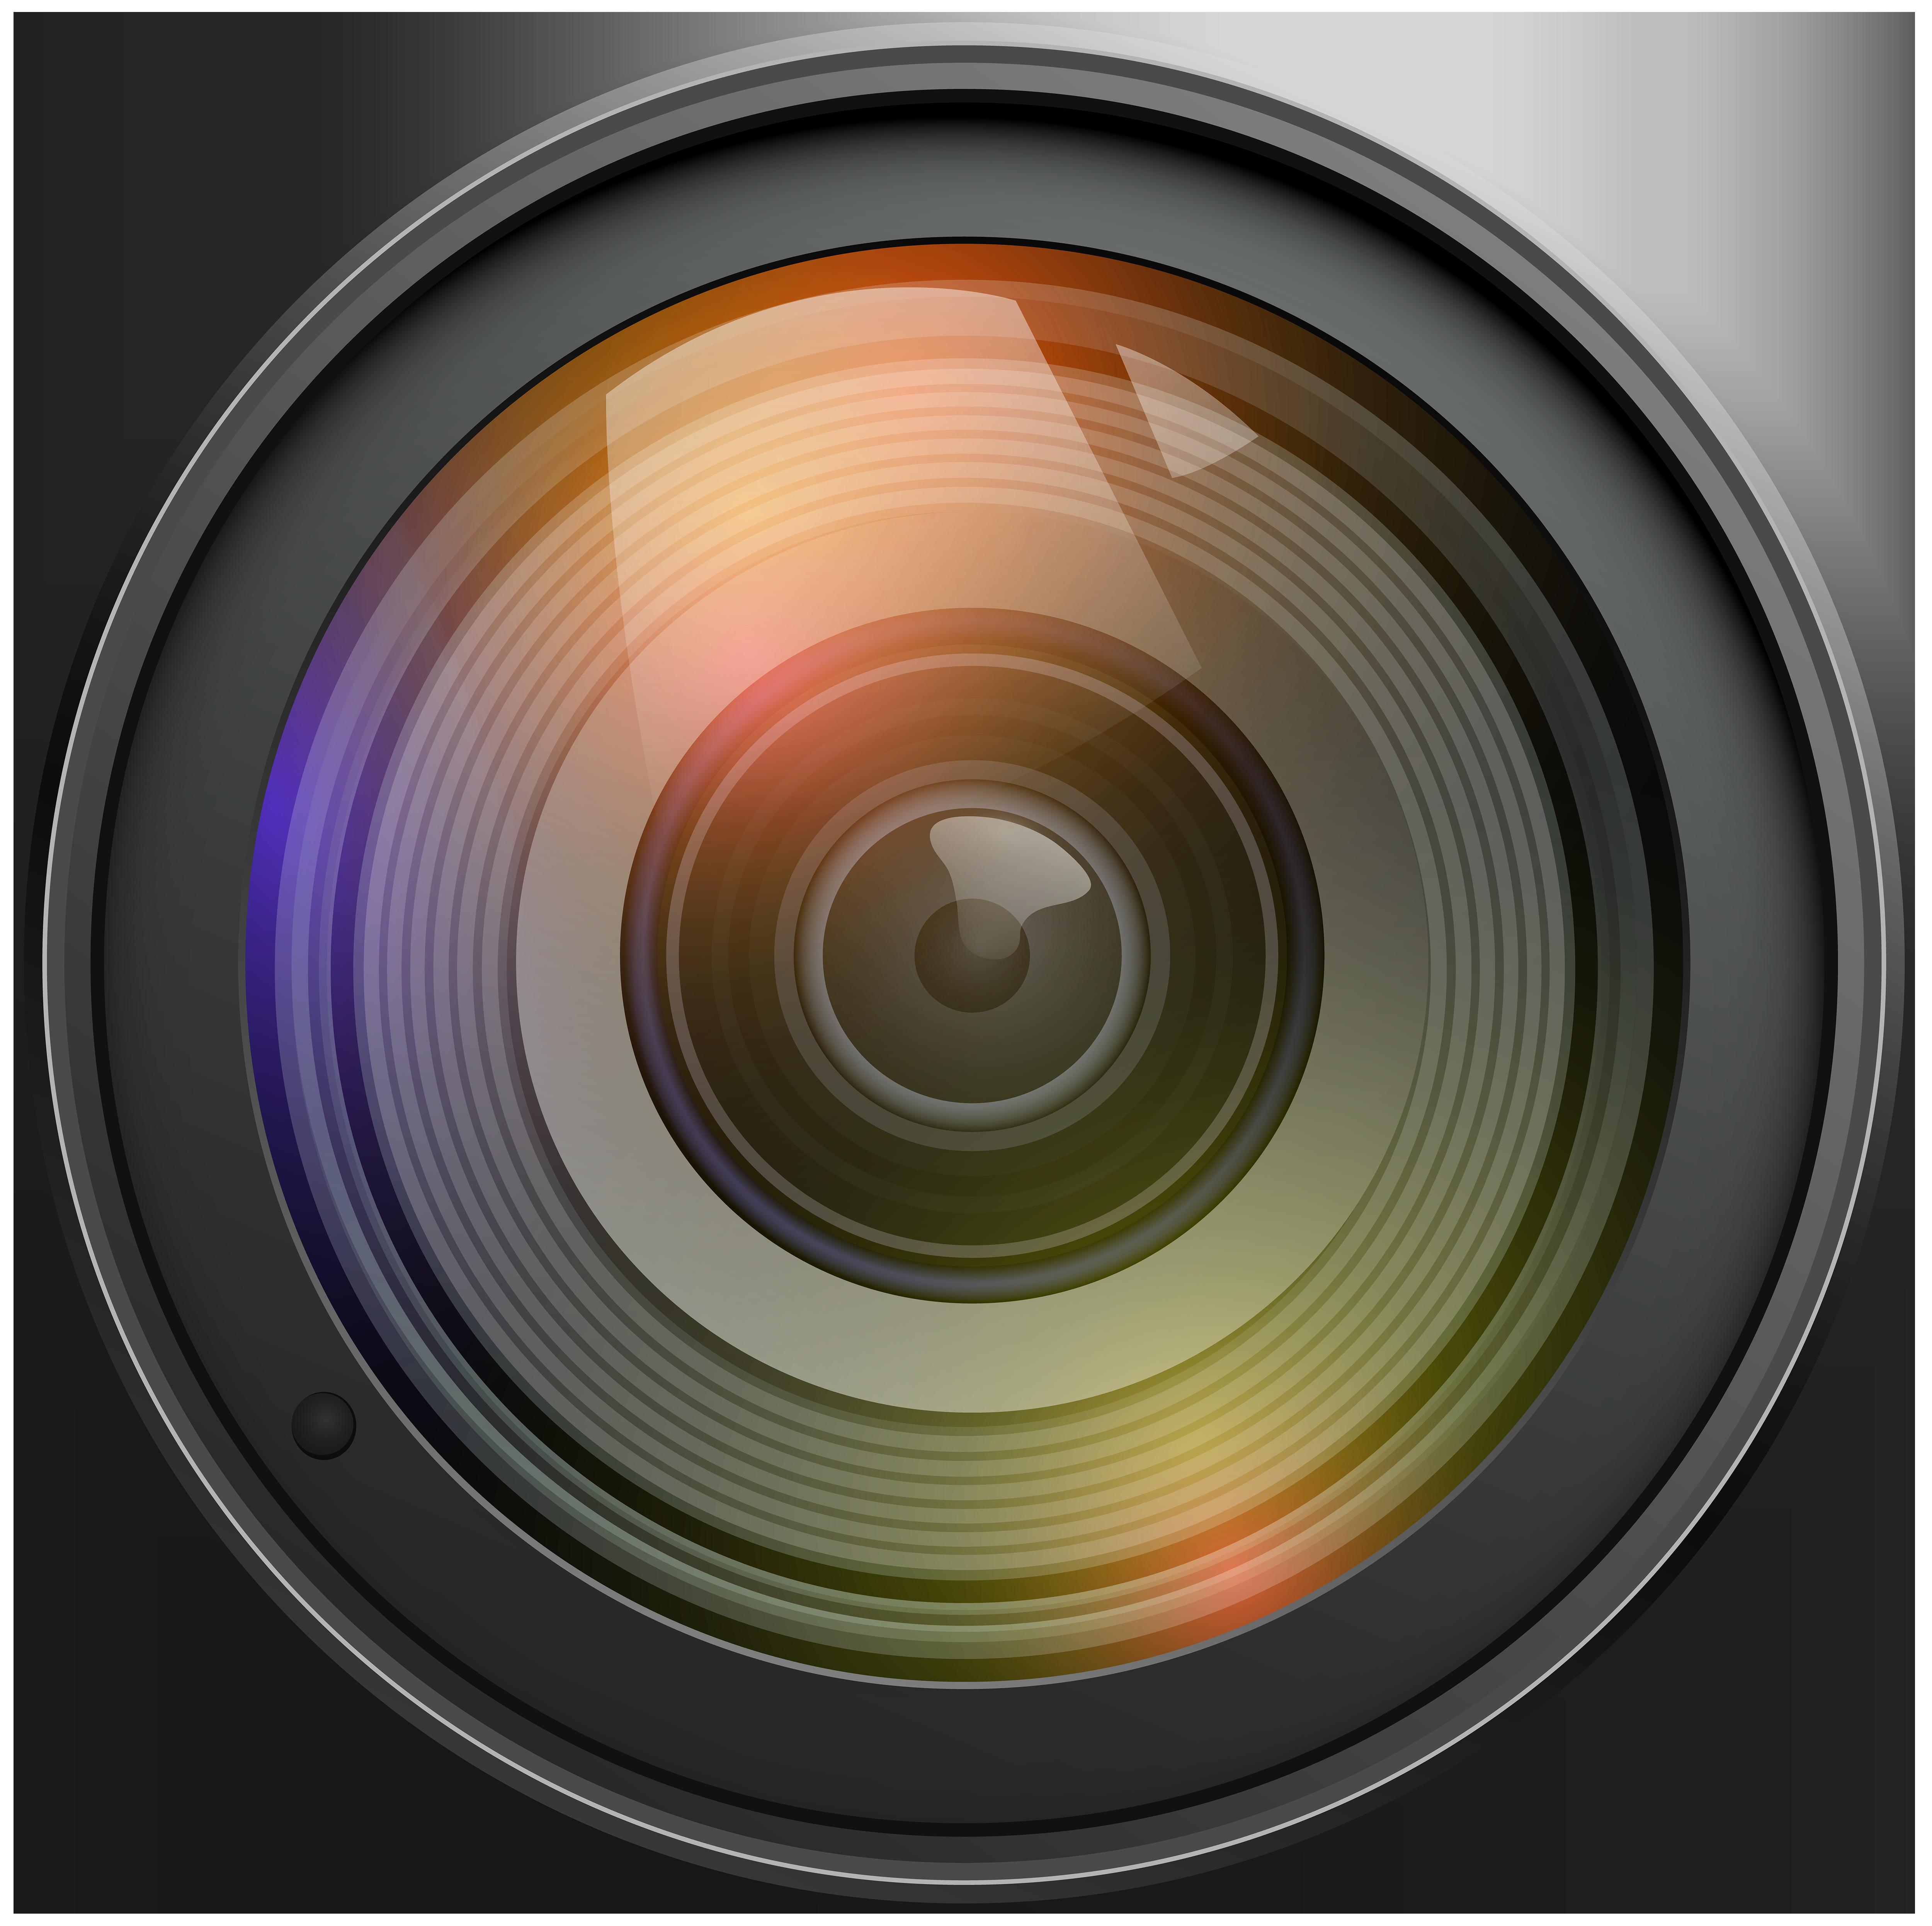 Clipart lens svg transparent download Lens Transparent PNG Clip Art | Gallery Yopriceville - High-Quality ... svg transparent download